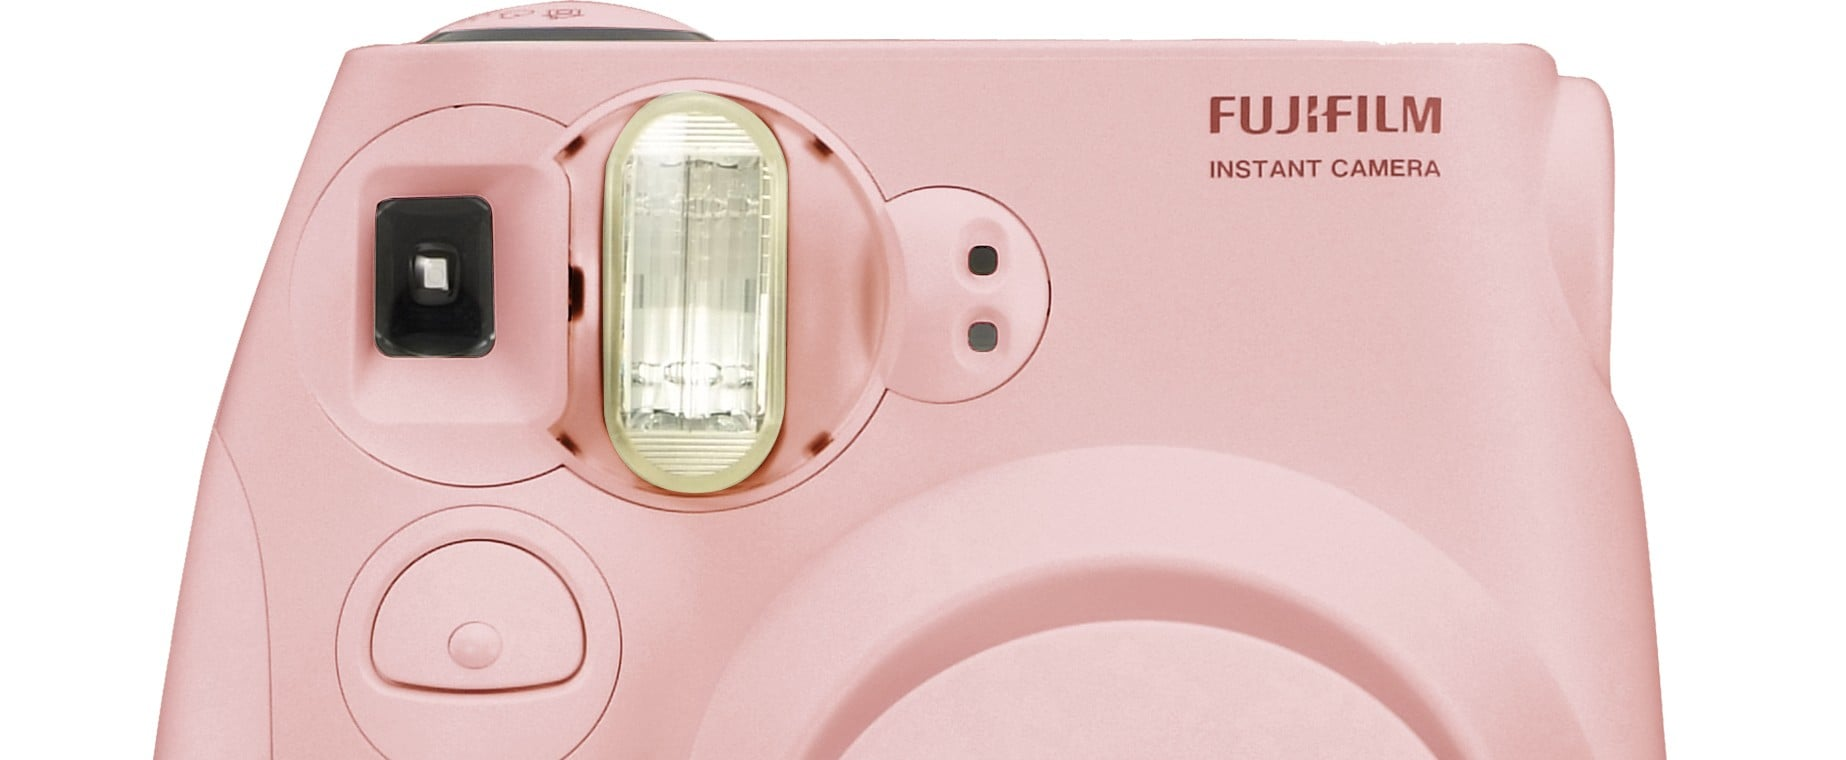 Fujifilm Instax Camera Black Friday Sale 2018